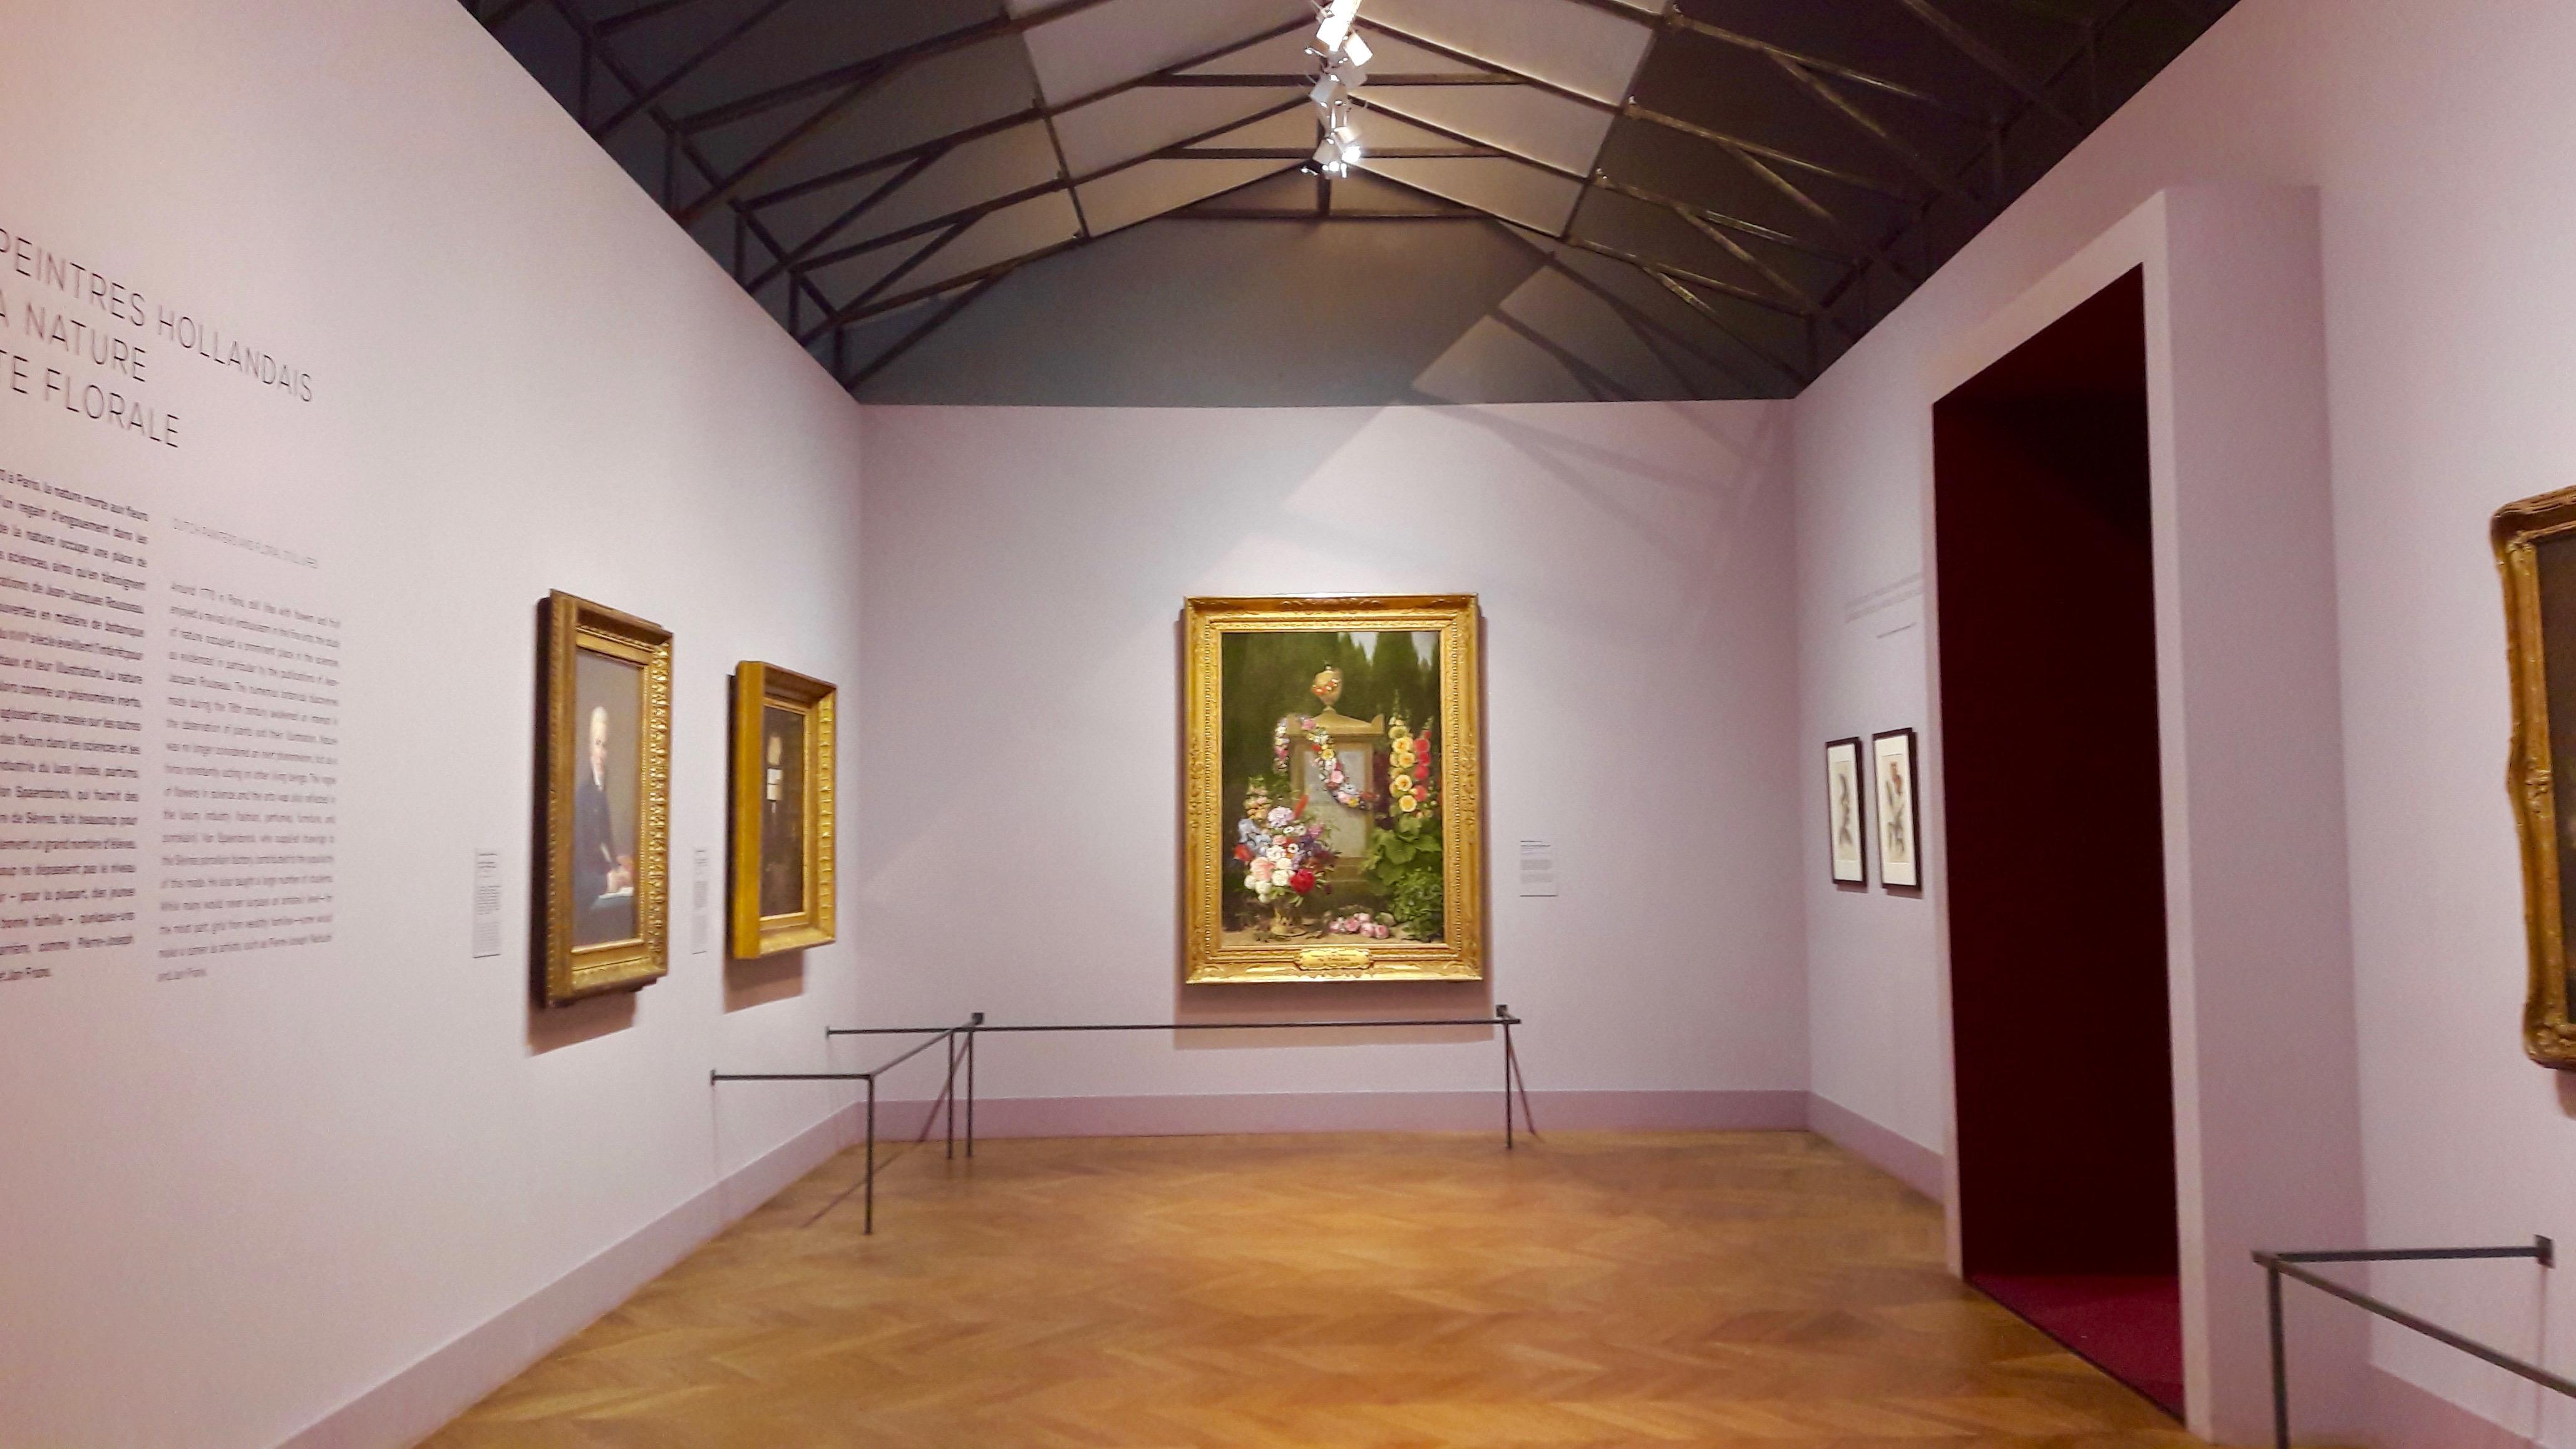 Peintres hollandais-Petit Palais